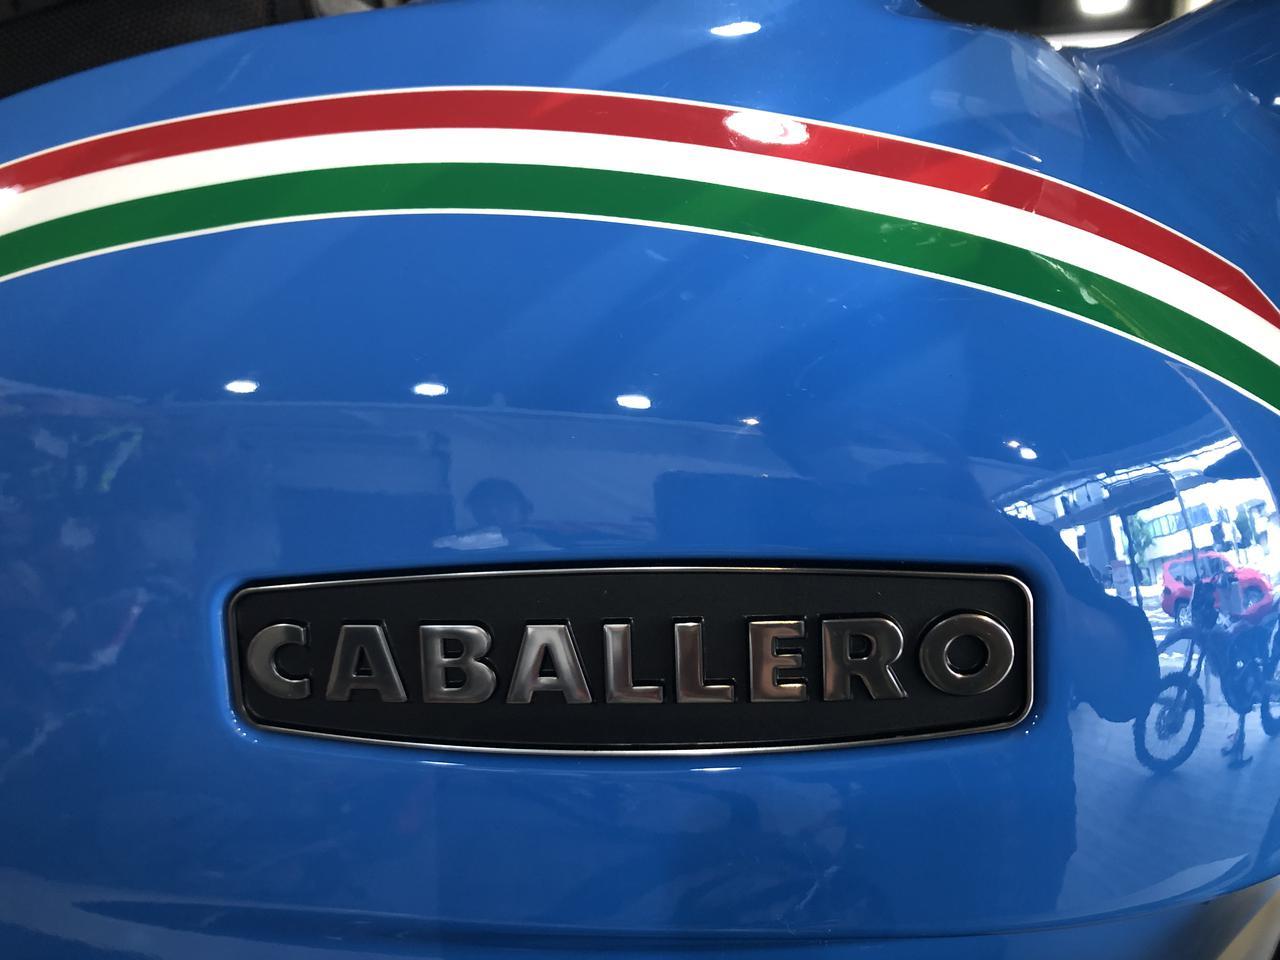 Images : 15番目の画像 - FANTIC「CABALLERO SCRAMBLER 500 ANNIVERSARY」の写真をもっと見る - webオートバイ